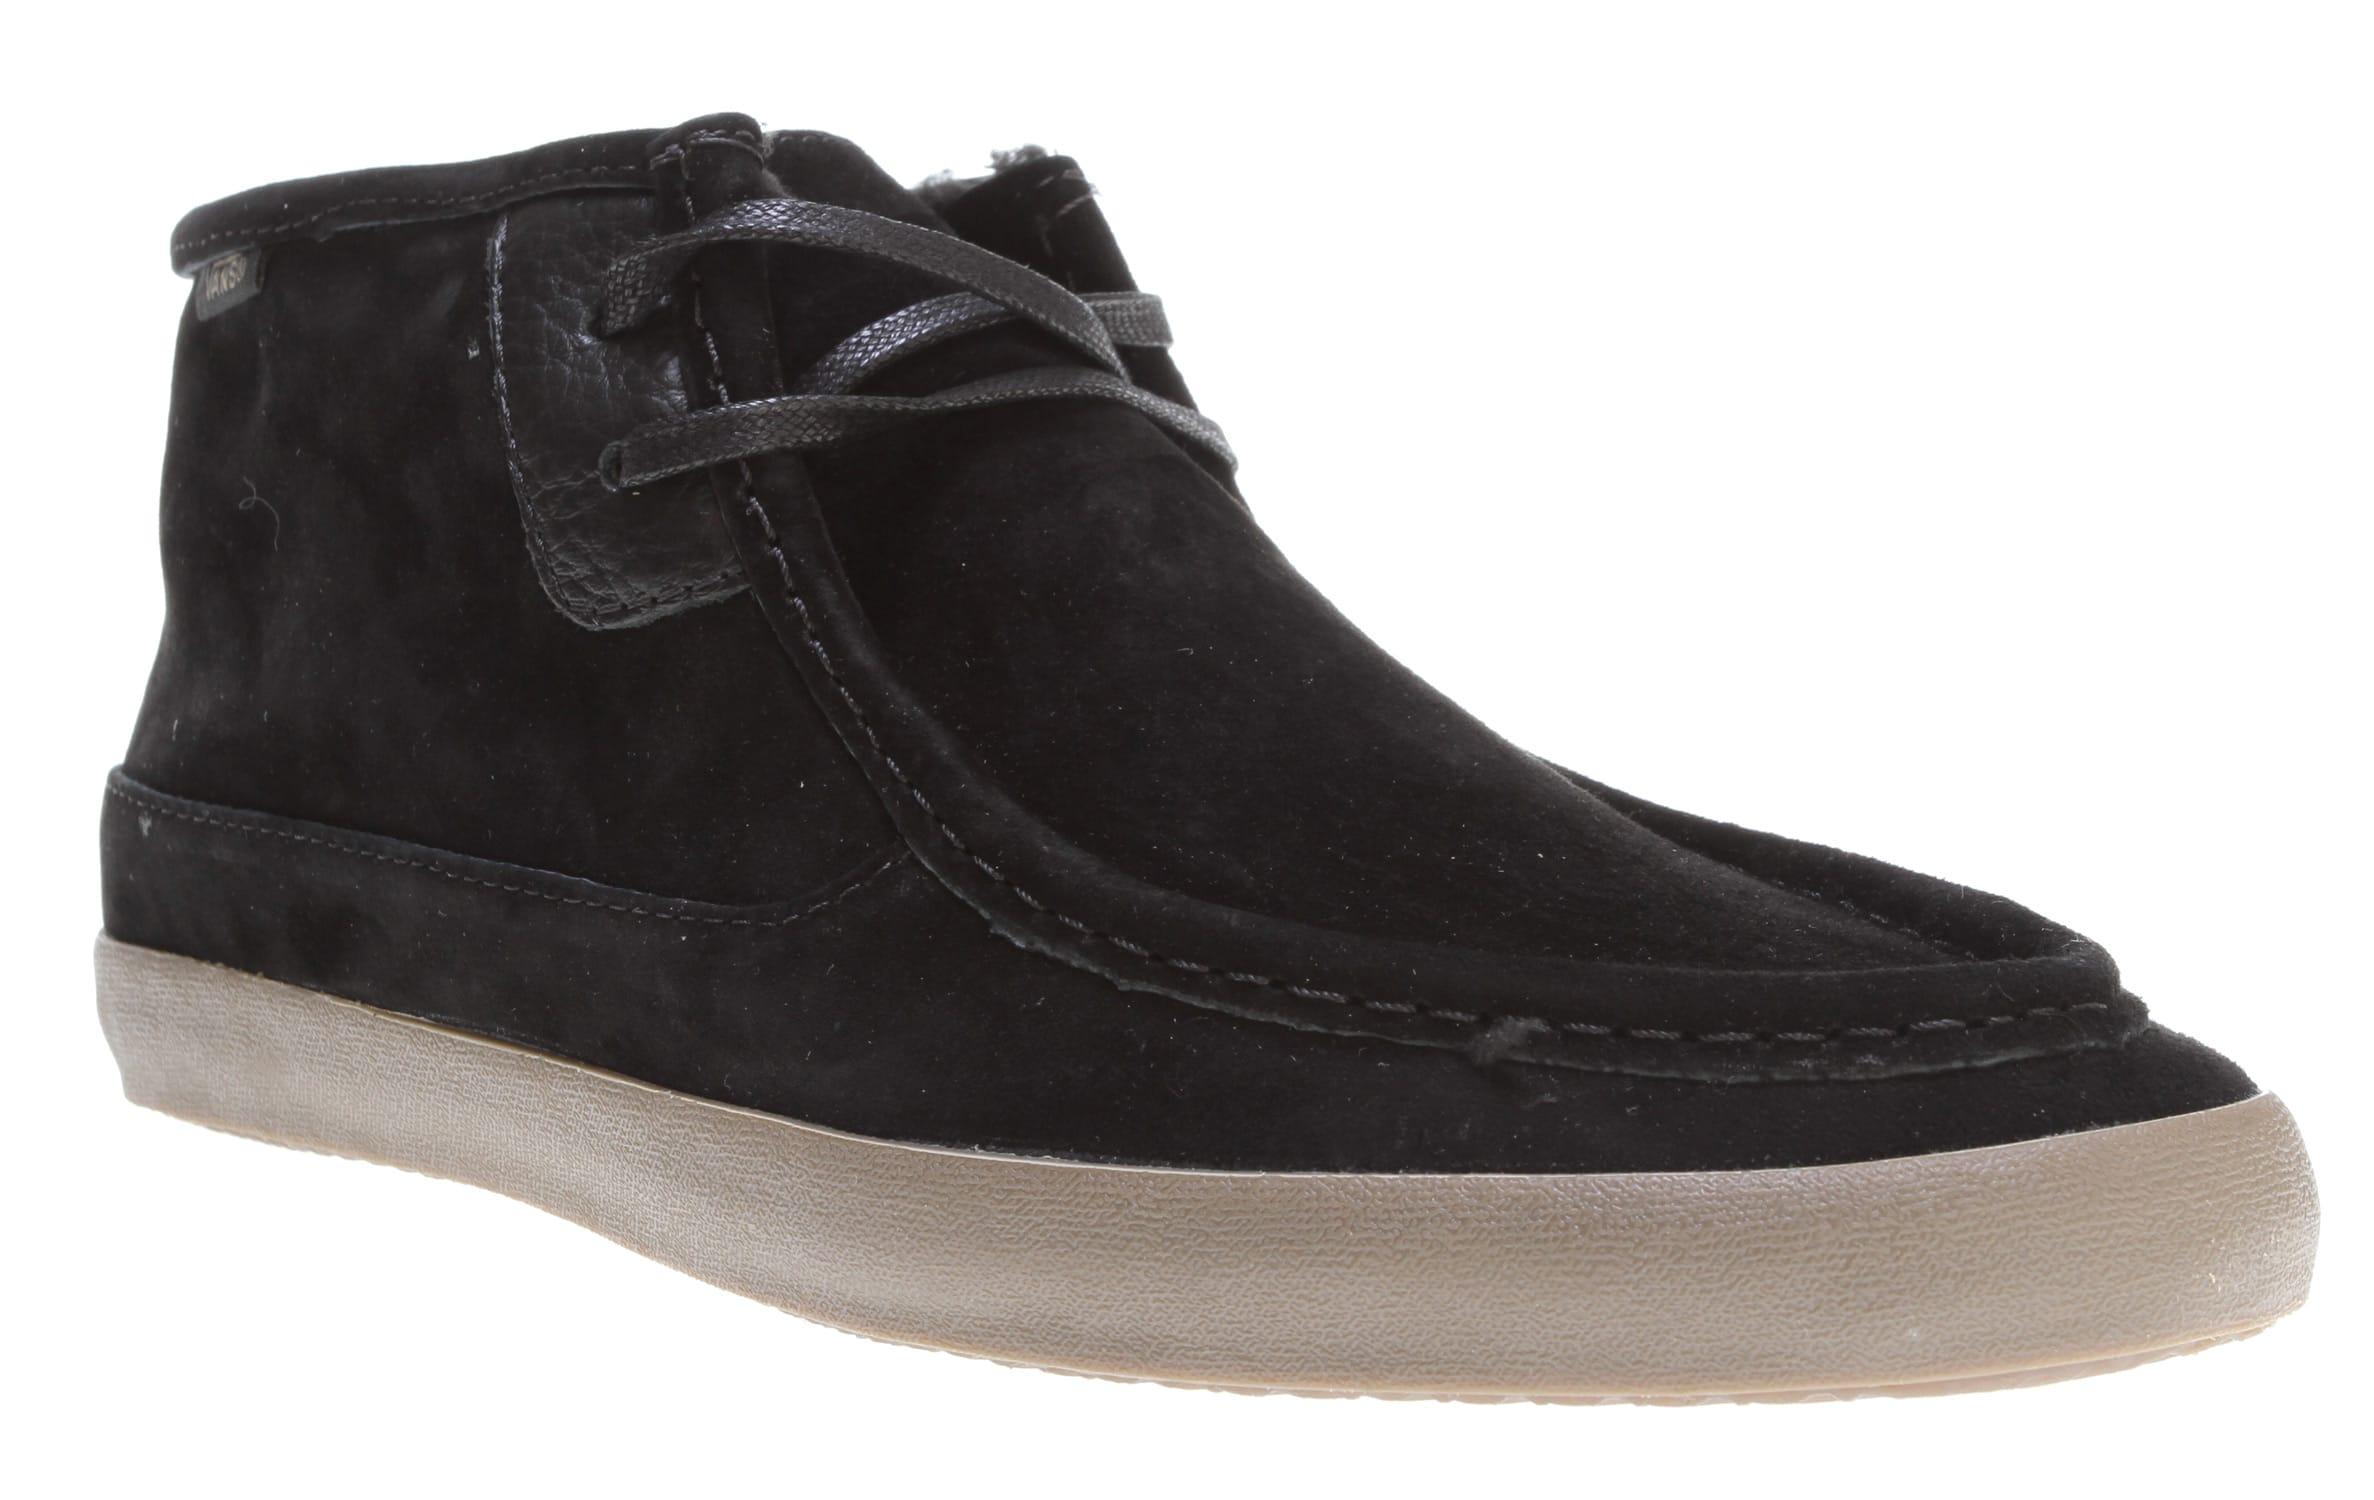 4f36e1c538 Vans Rata Mid Shoes - thumbnail 2